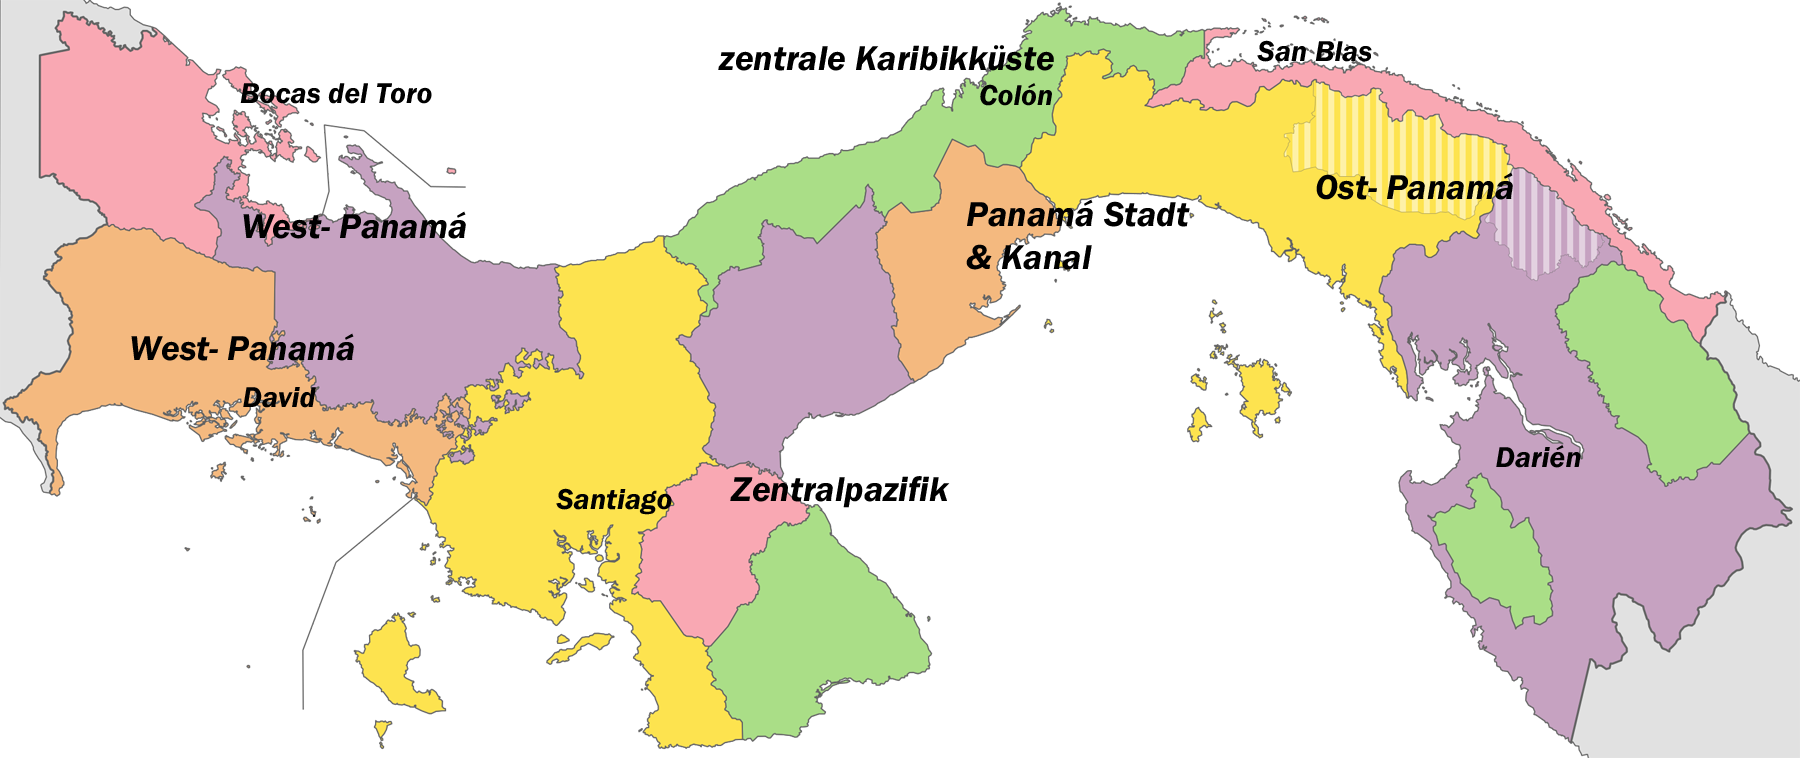 Region S Karte.The Five Regions Of Panama